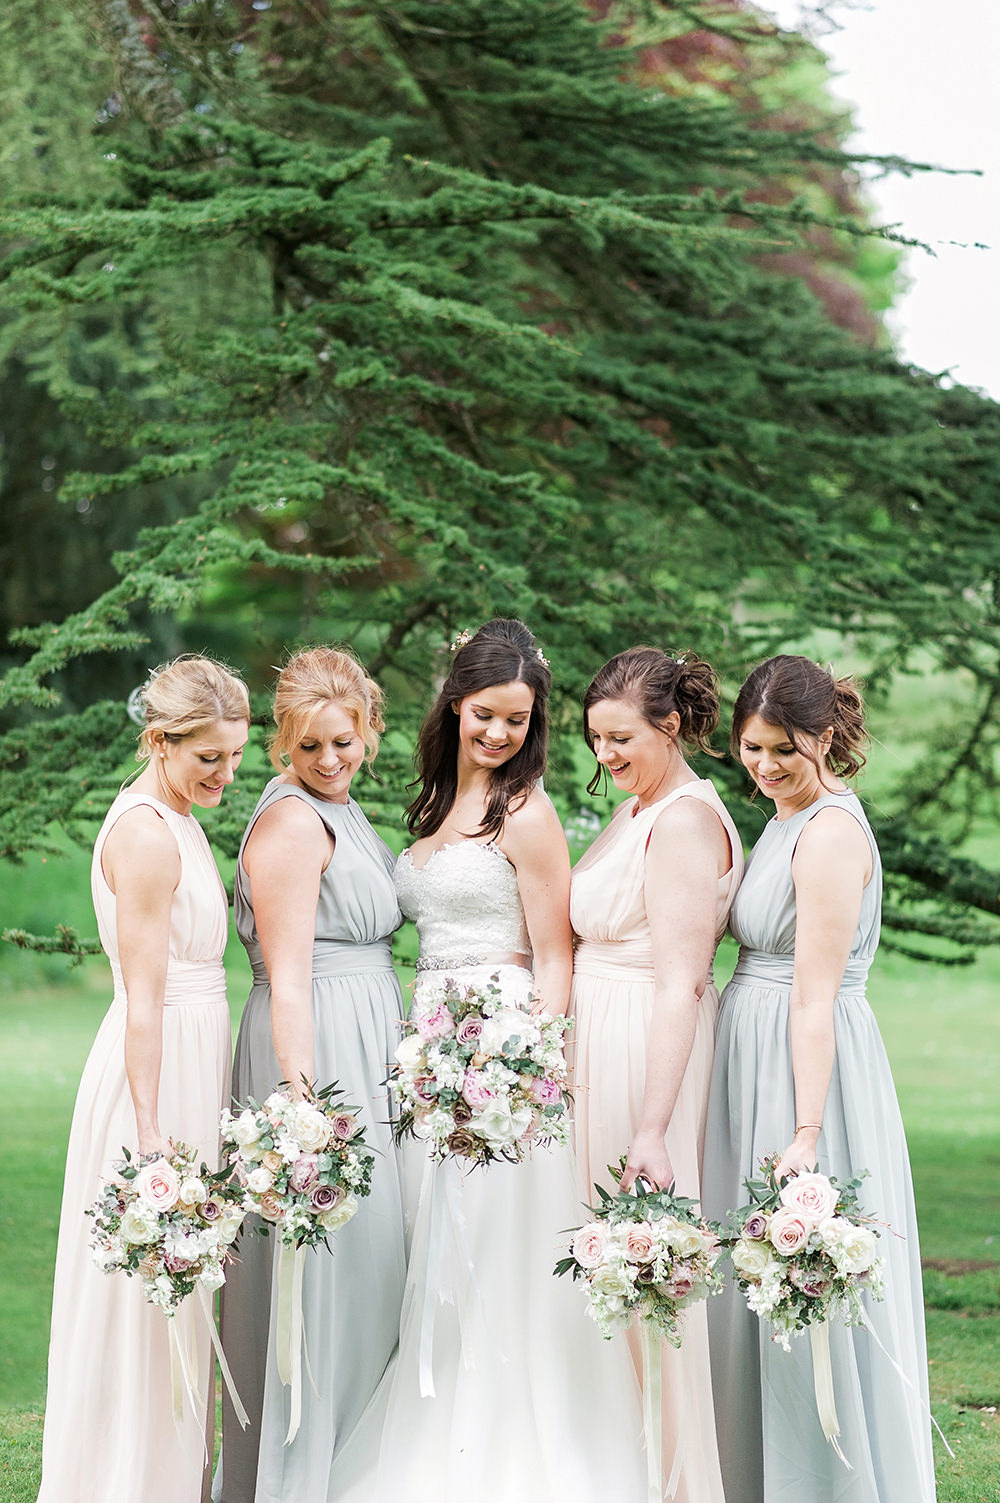 Bride Bridal Gown Dress Strapless Sweetheart Neckline Ribbon Belt Pink Mismatched Pastel Bridesmaids Edmondsham House Wedding Darima Frampton Photography